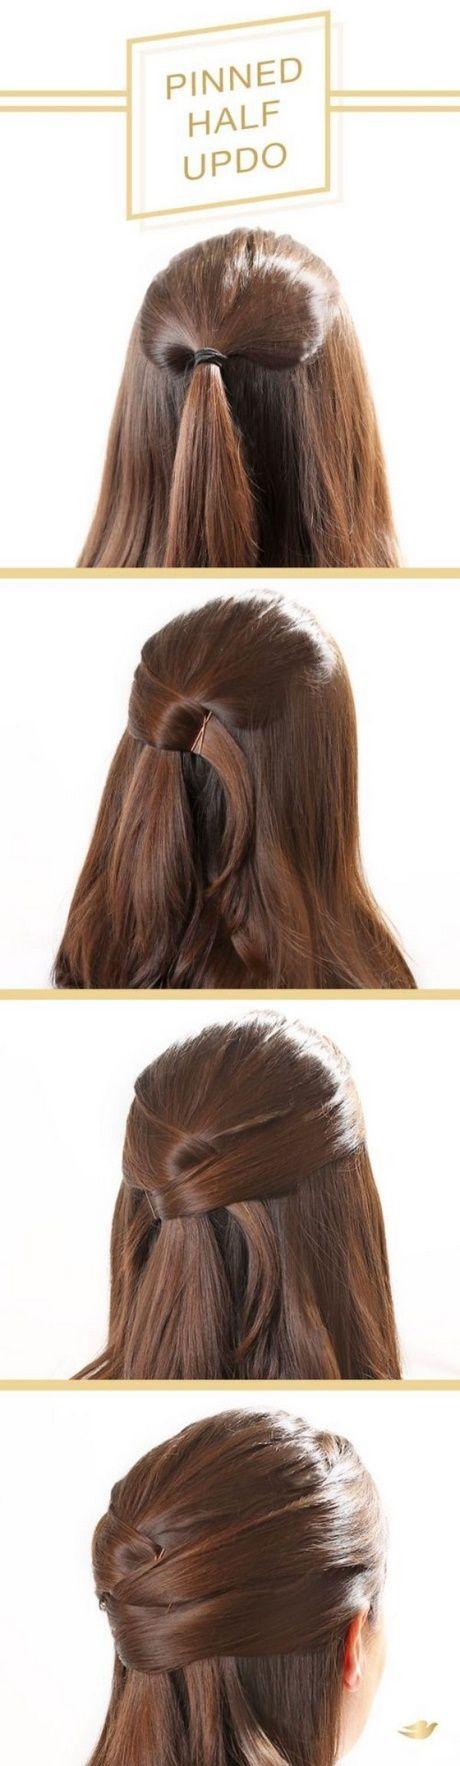 5 Minuten Frisuren Fur Schulterlanges Haar Frisuren Stile 2018 Hair Styles Long Hair Styles Medium Length Hair Styles